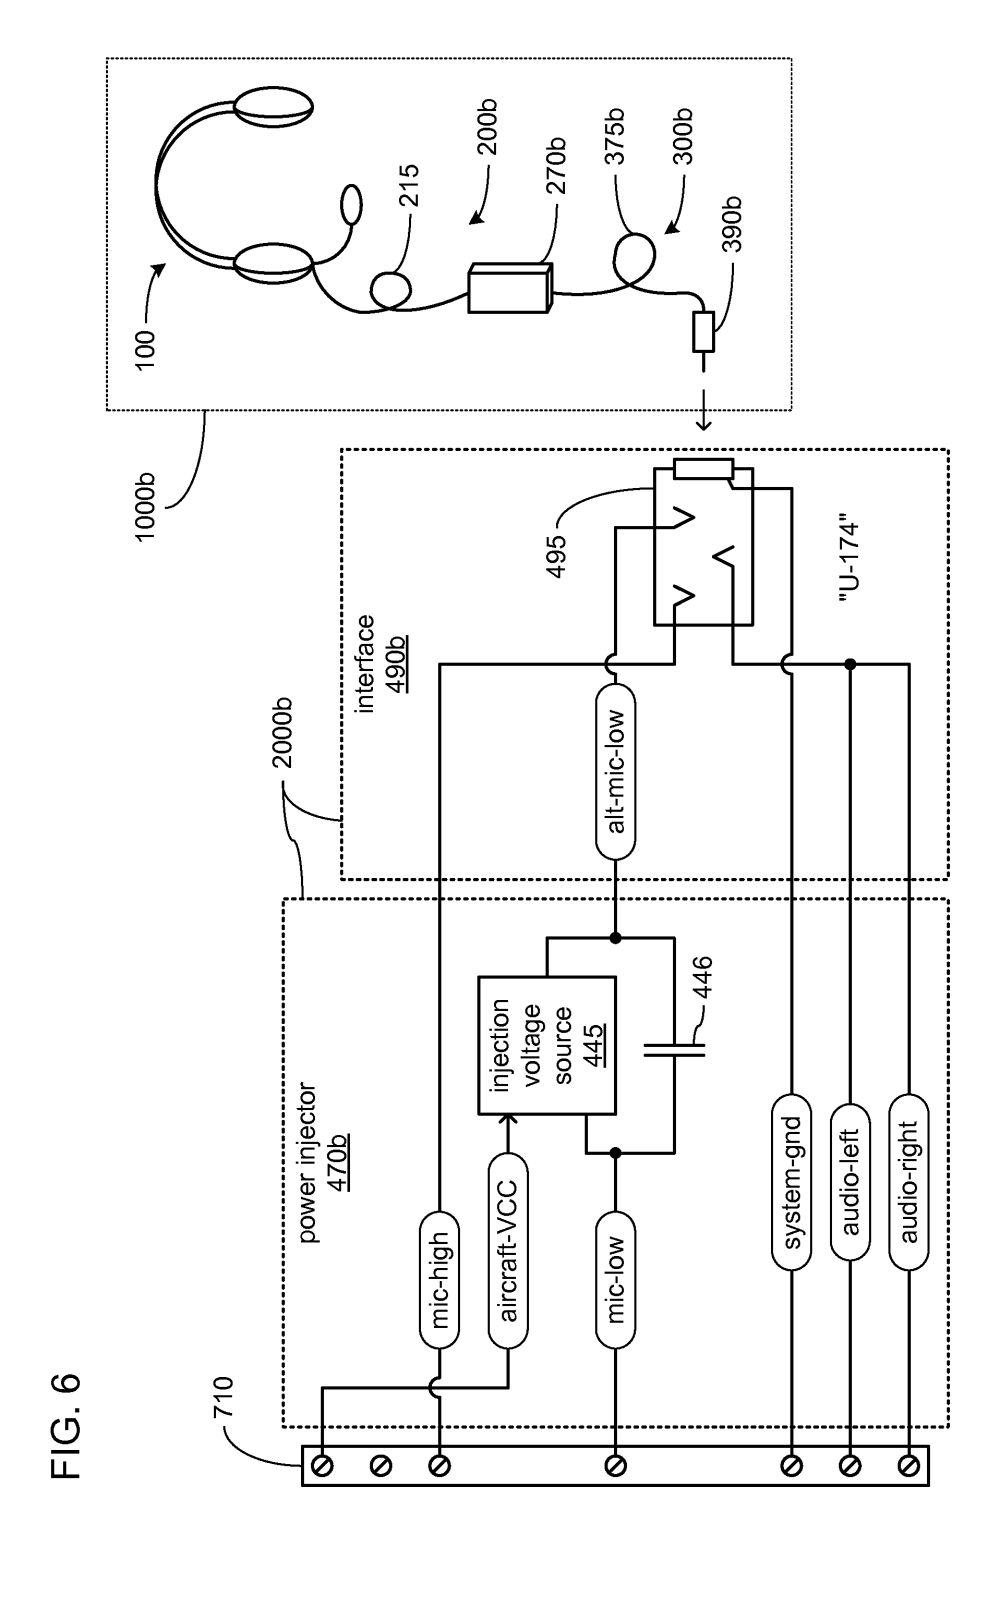 medium resolution of pilot headset wiring diagram somurich com headset wiring diagram